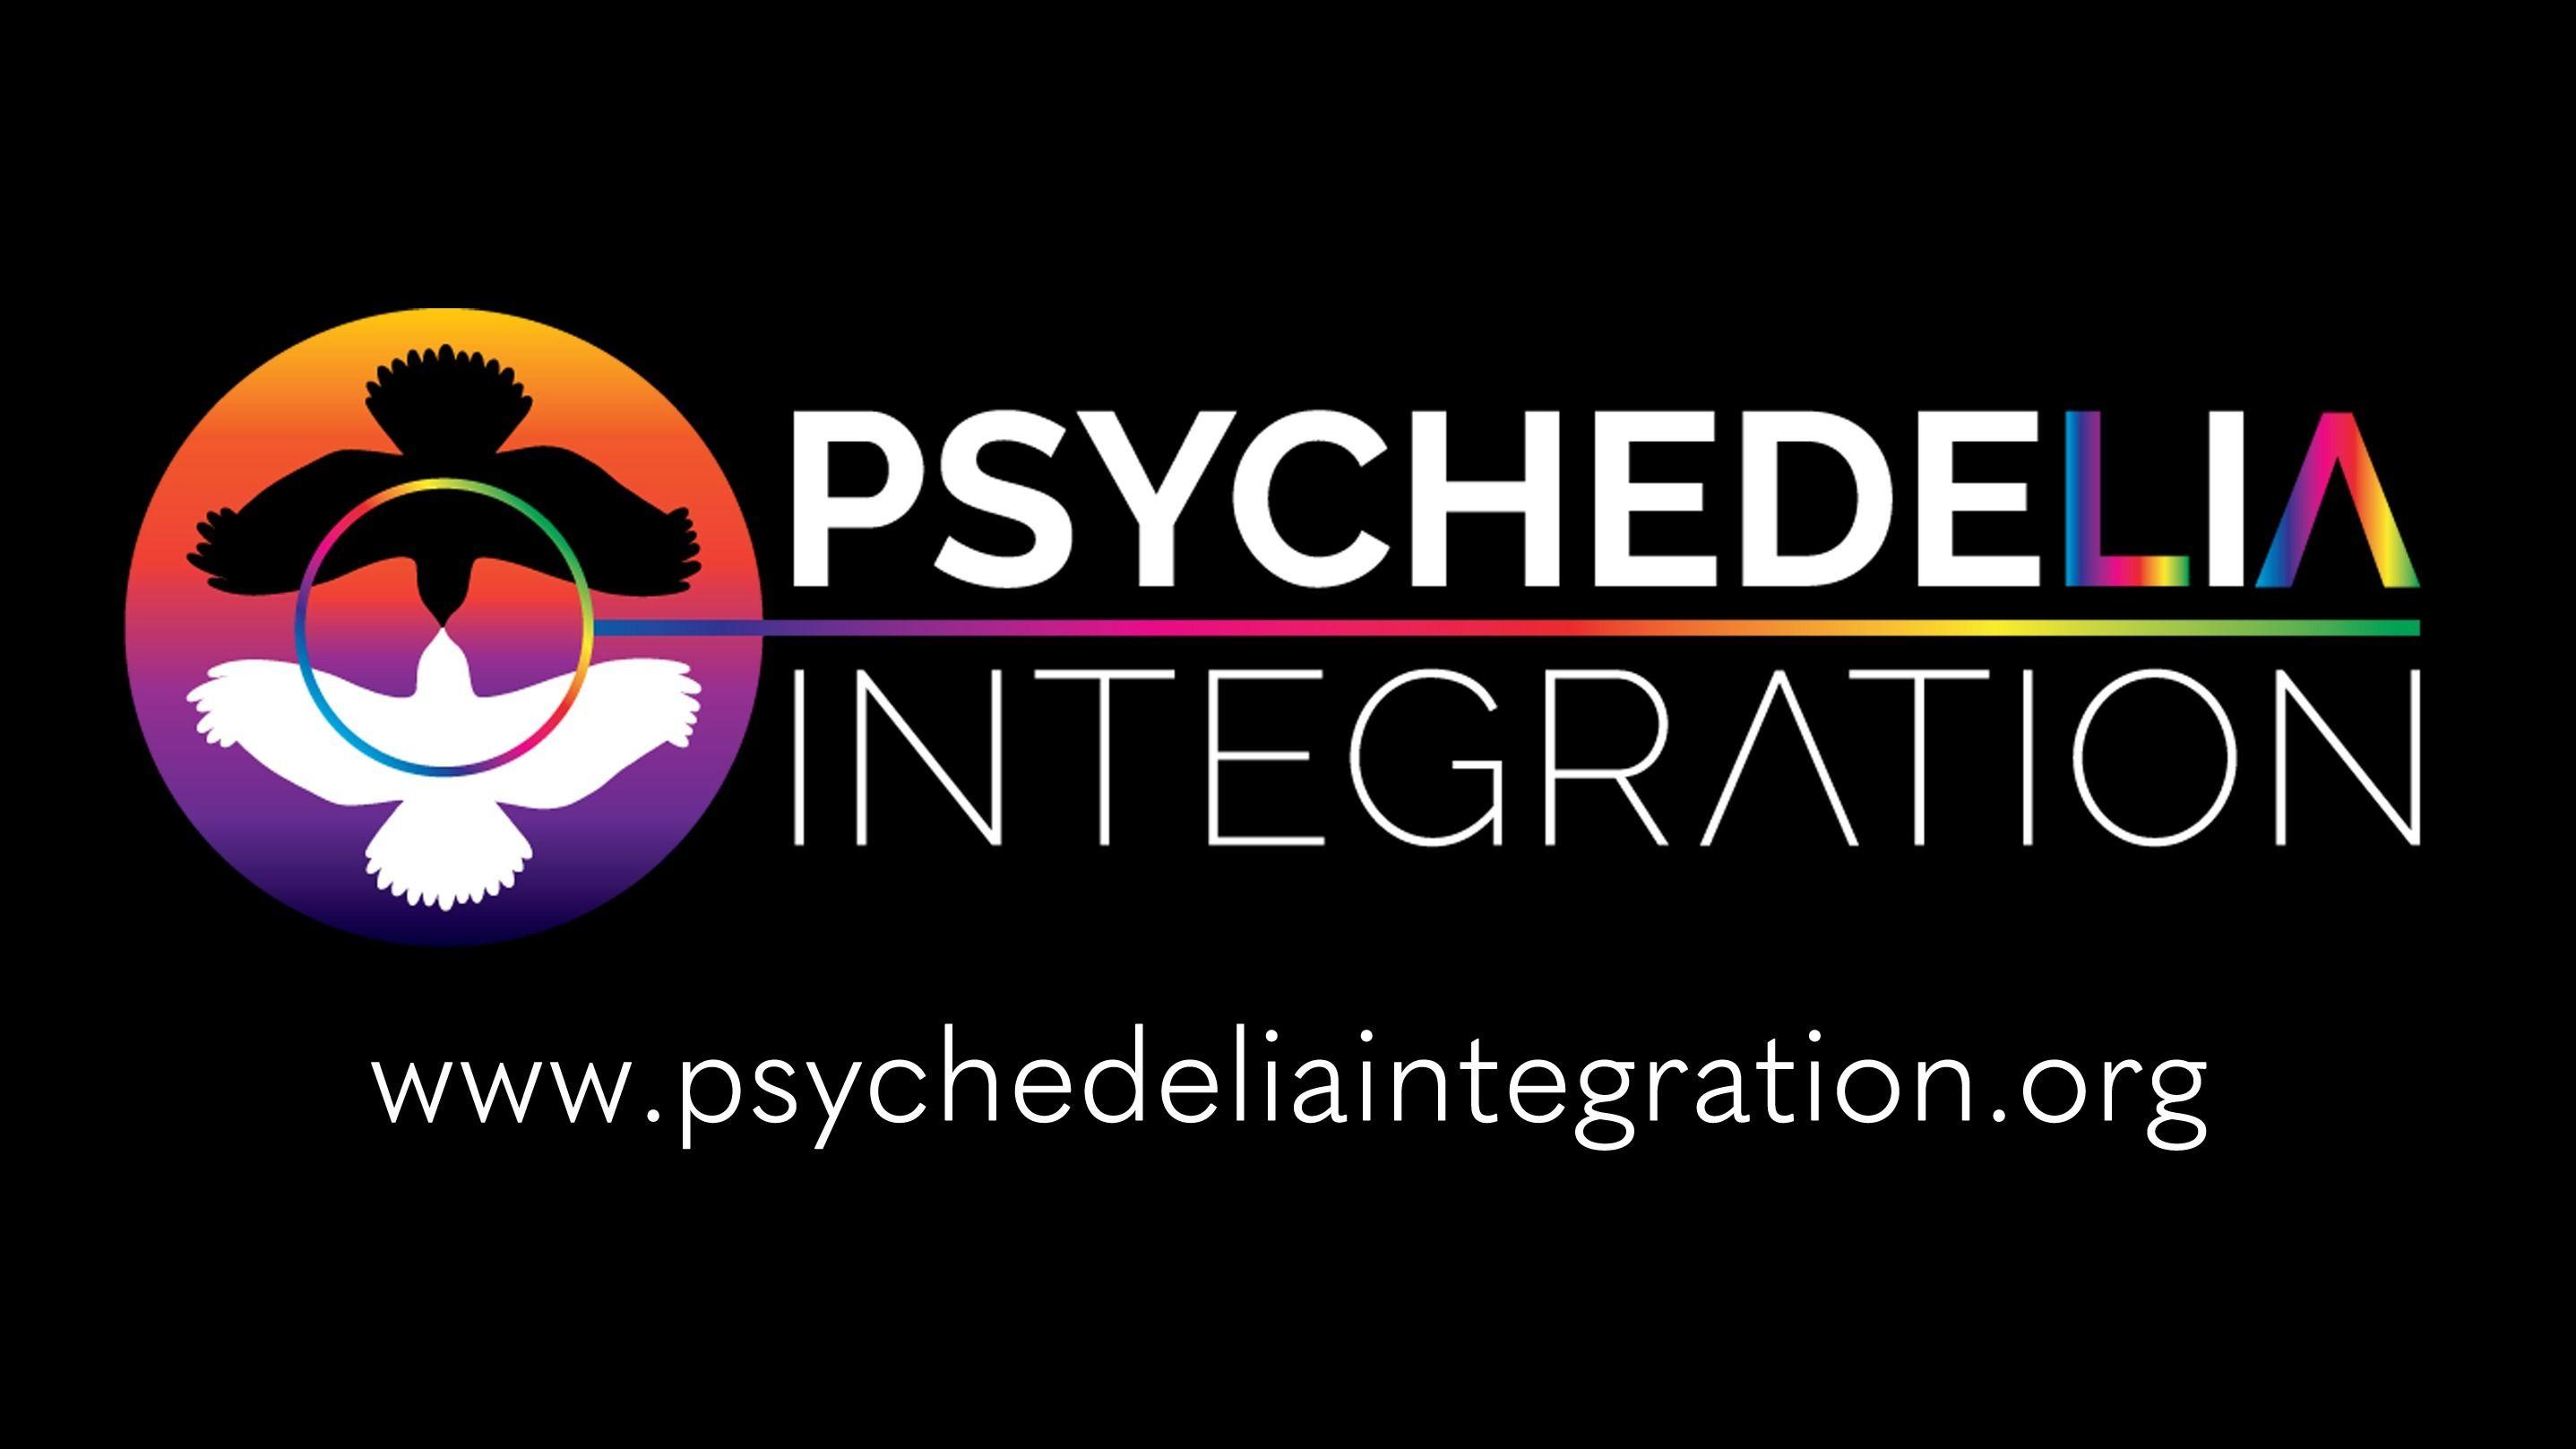 PsychedeLiA Integration